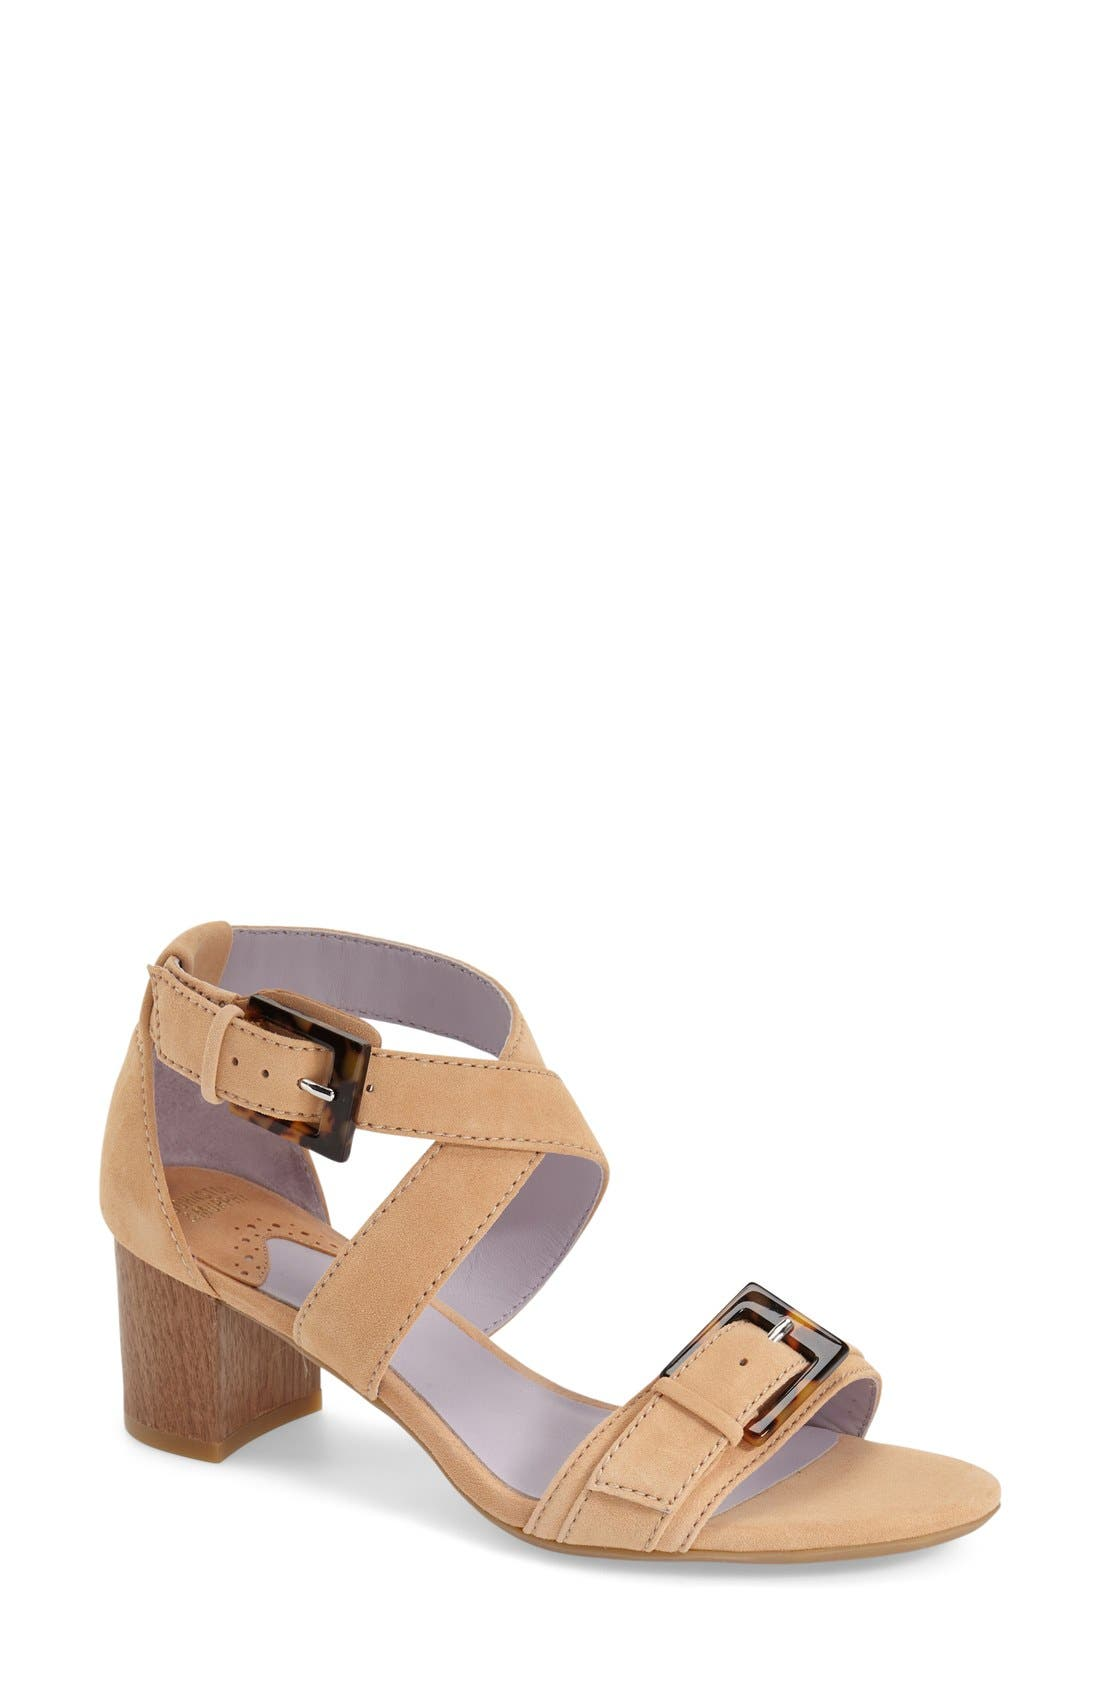 Alternate Image 1 Selected - Johnston & Murphy 'Katarina' Block Heel Sandal (Women)